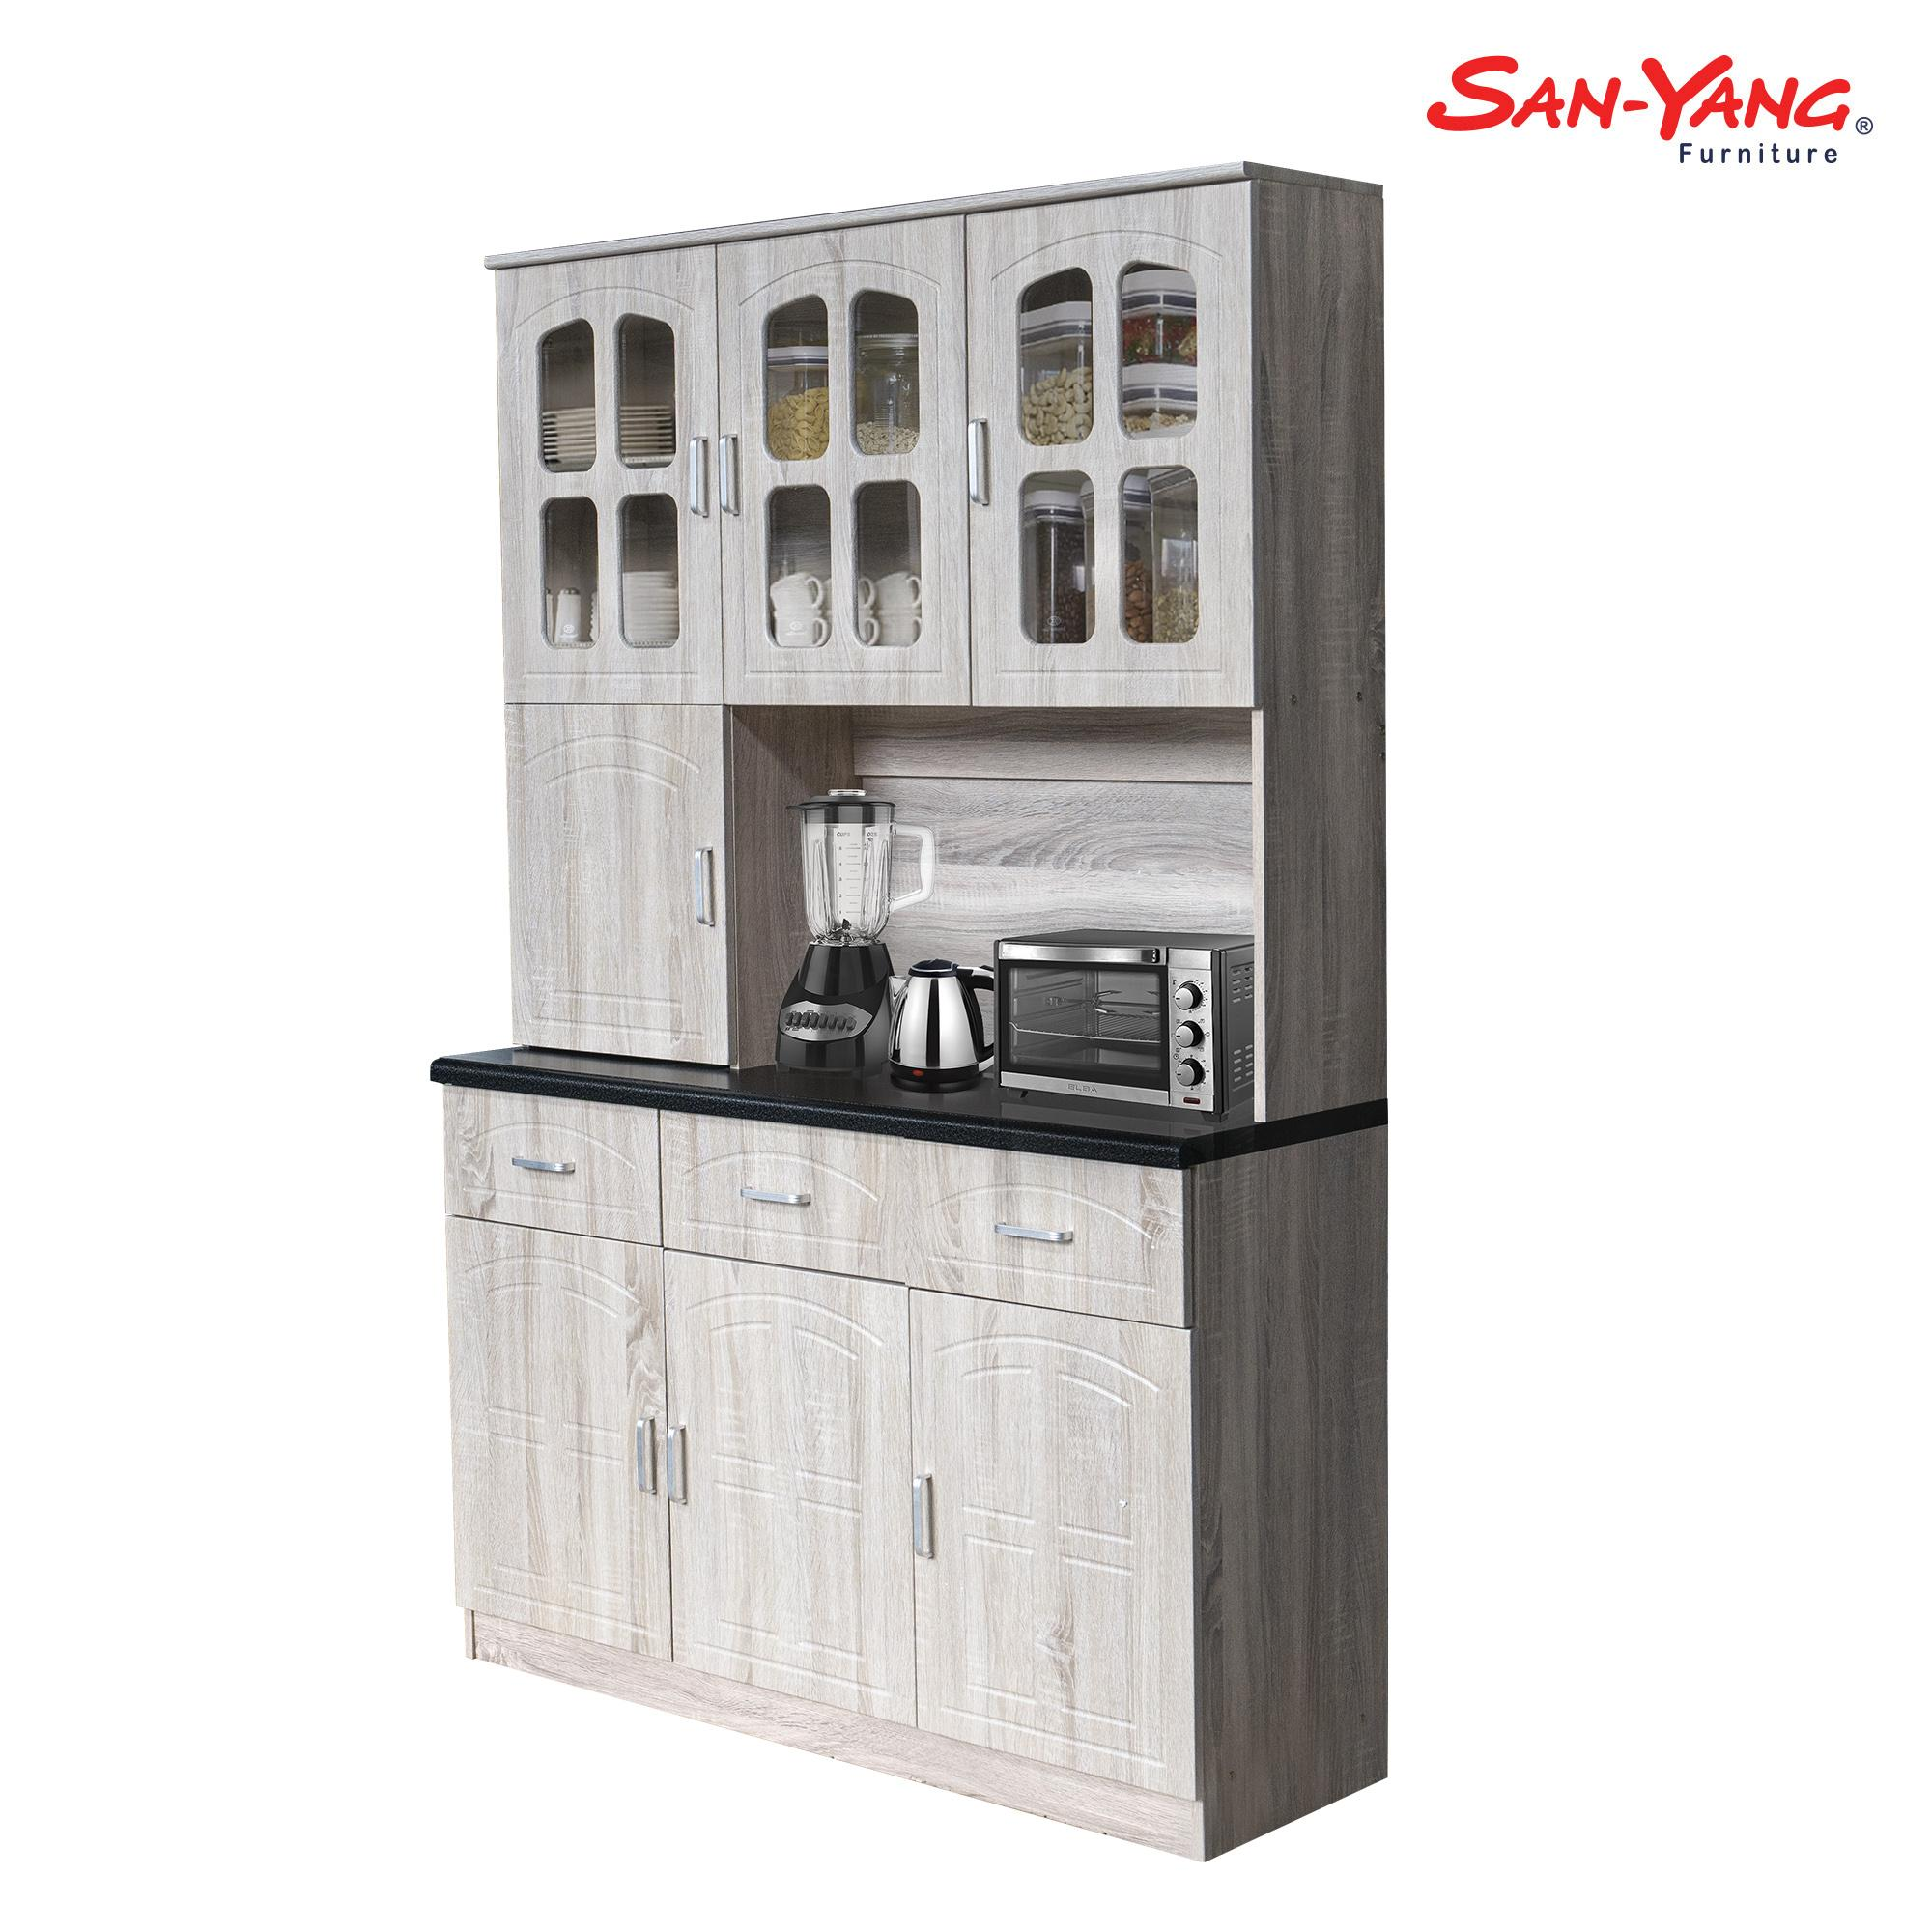 Kitchen Cabinet Brands Reviews: Kitchen Furniture For Sale